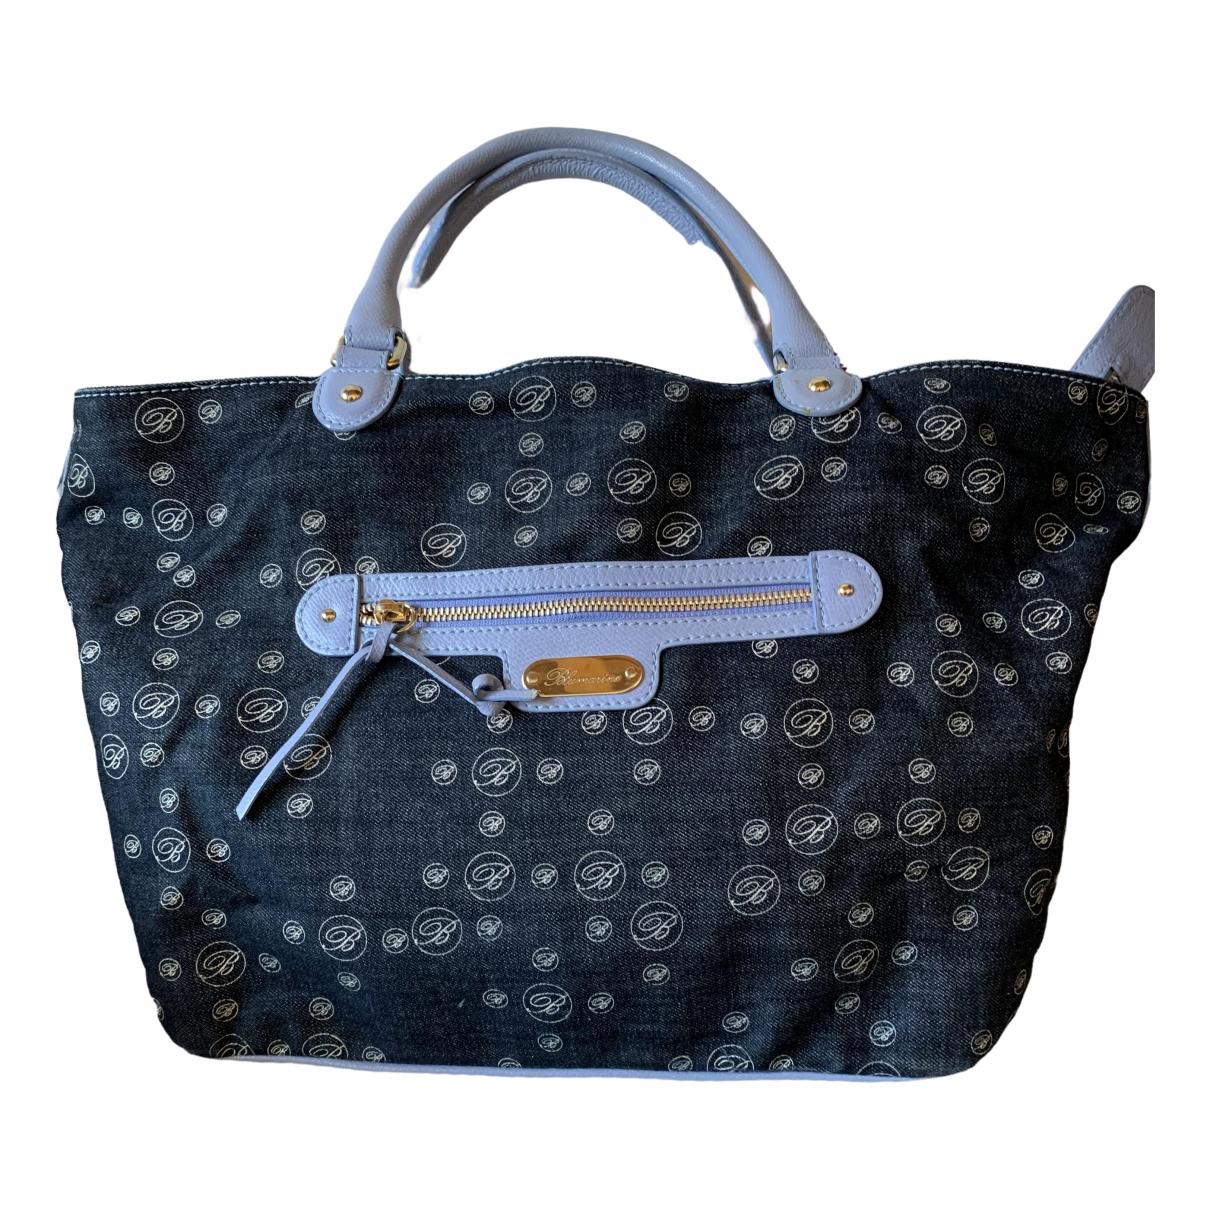 Blumarine \N Blue Denim - Jeans handbag for Women \N